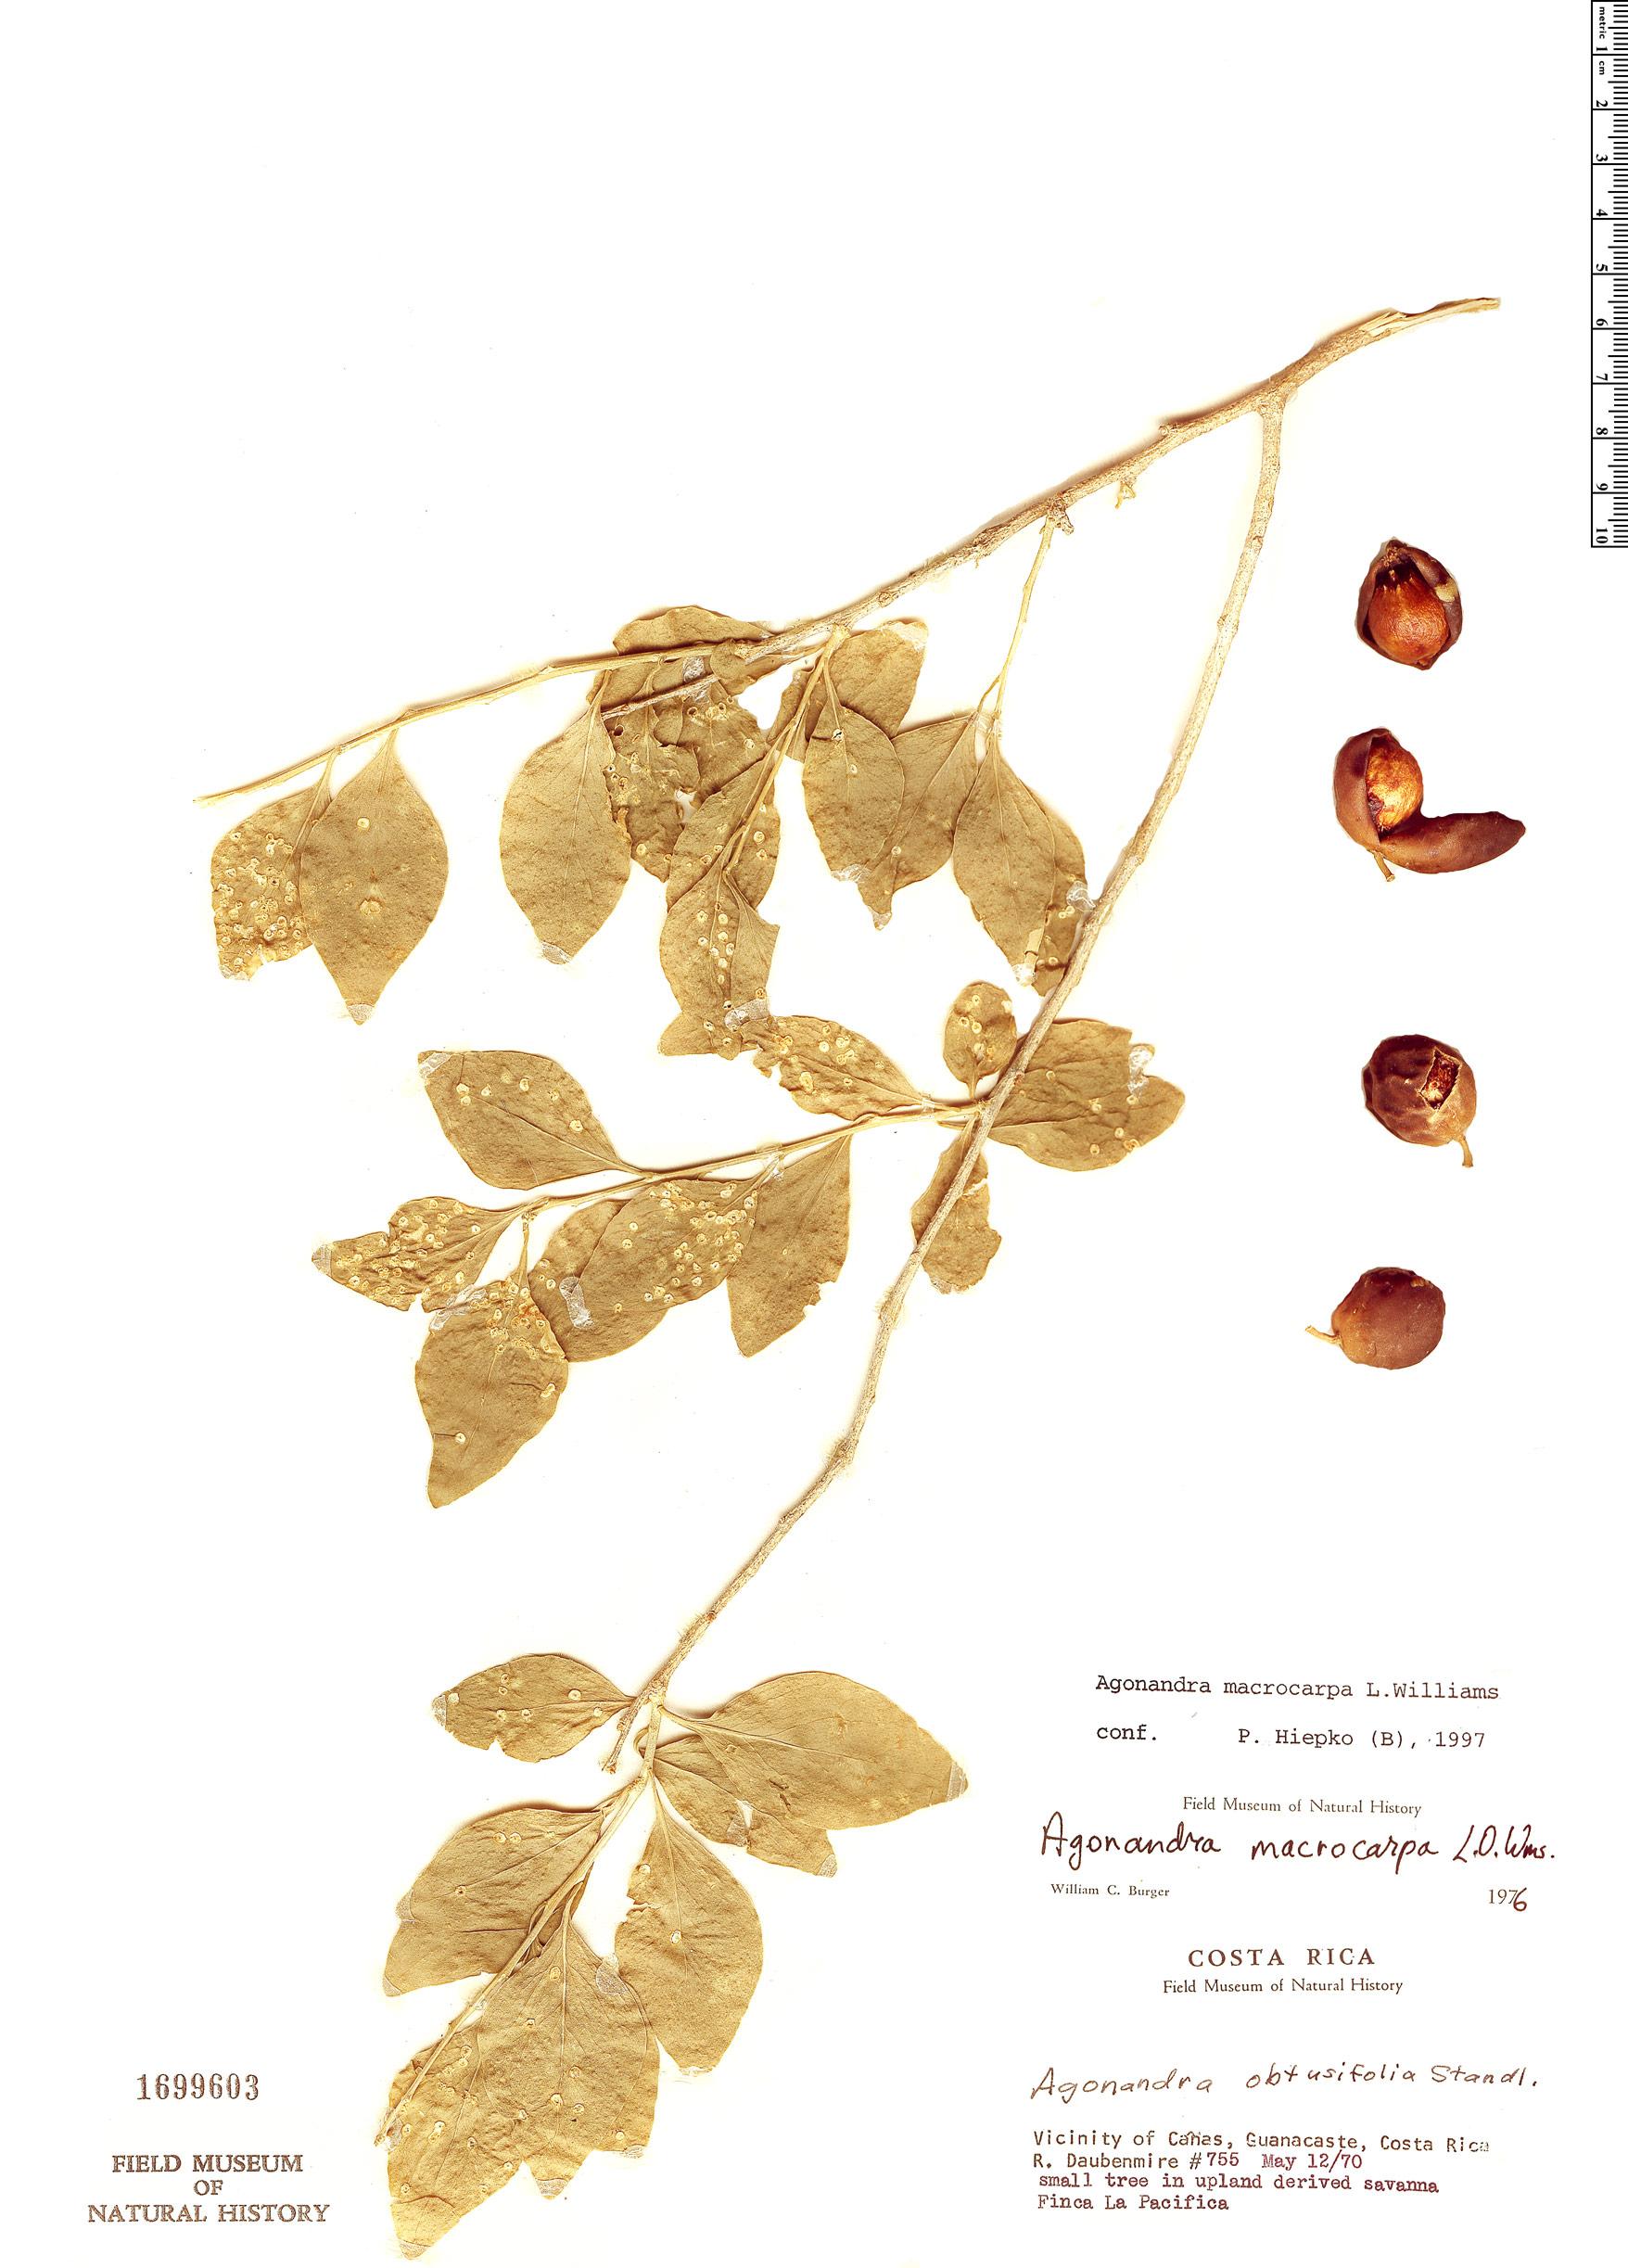 Specimen: Agonandra macrocarpa